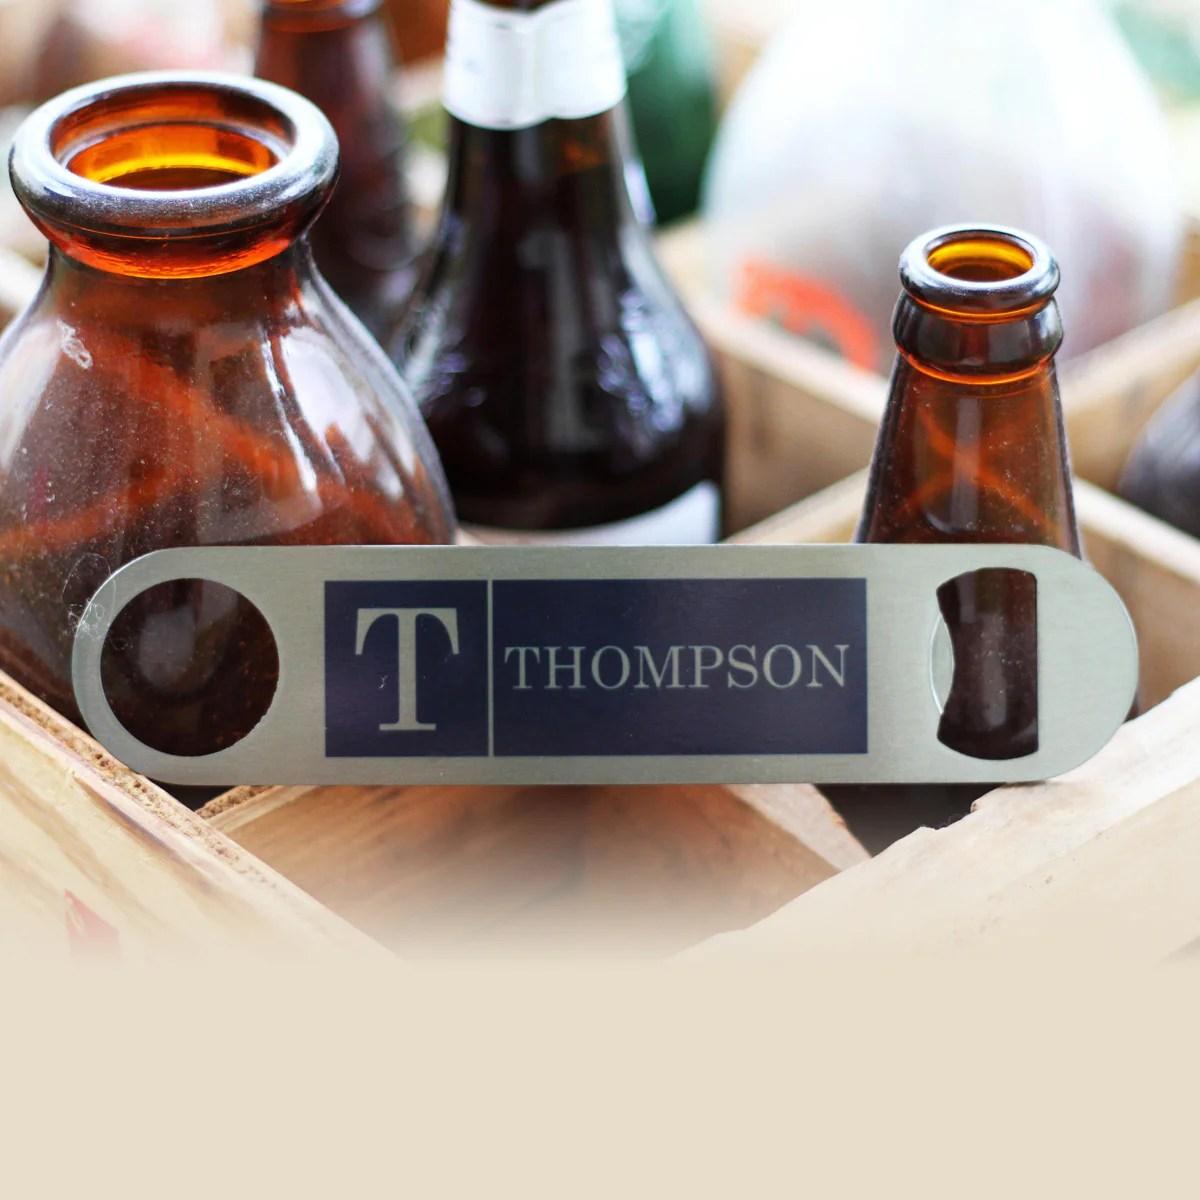 personalized bottle opener thompson